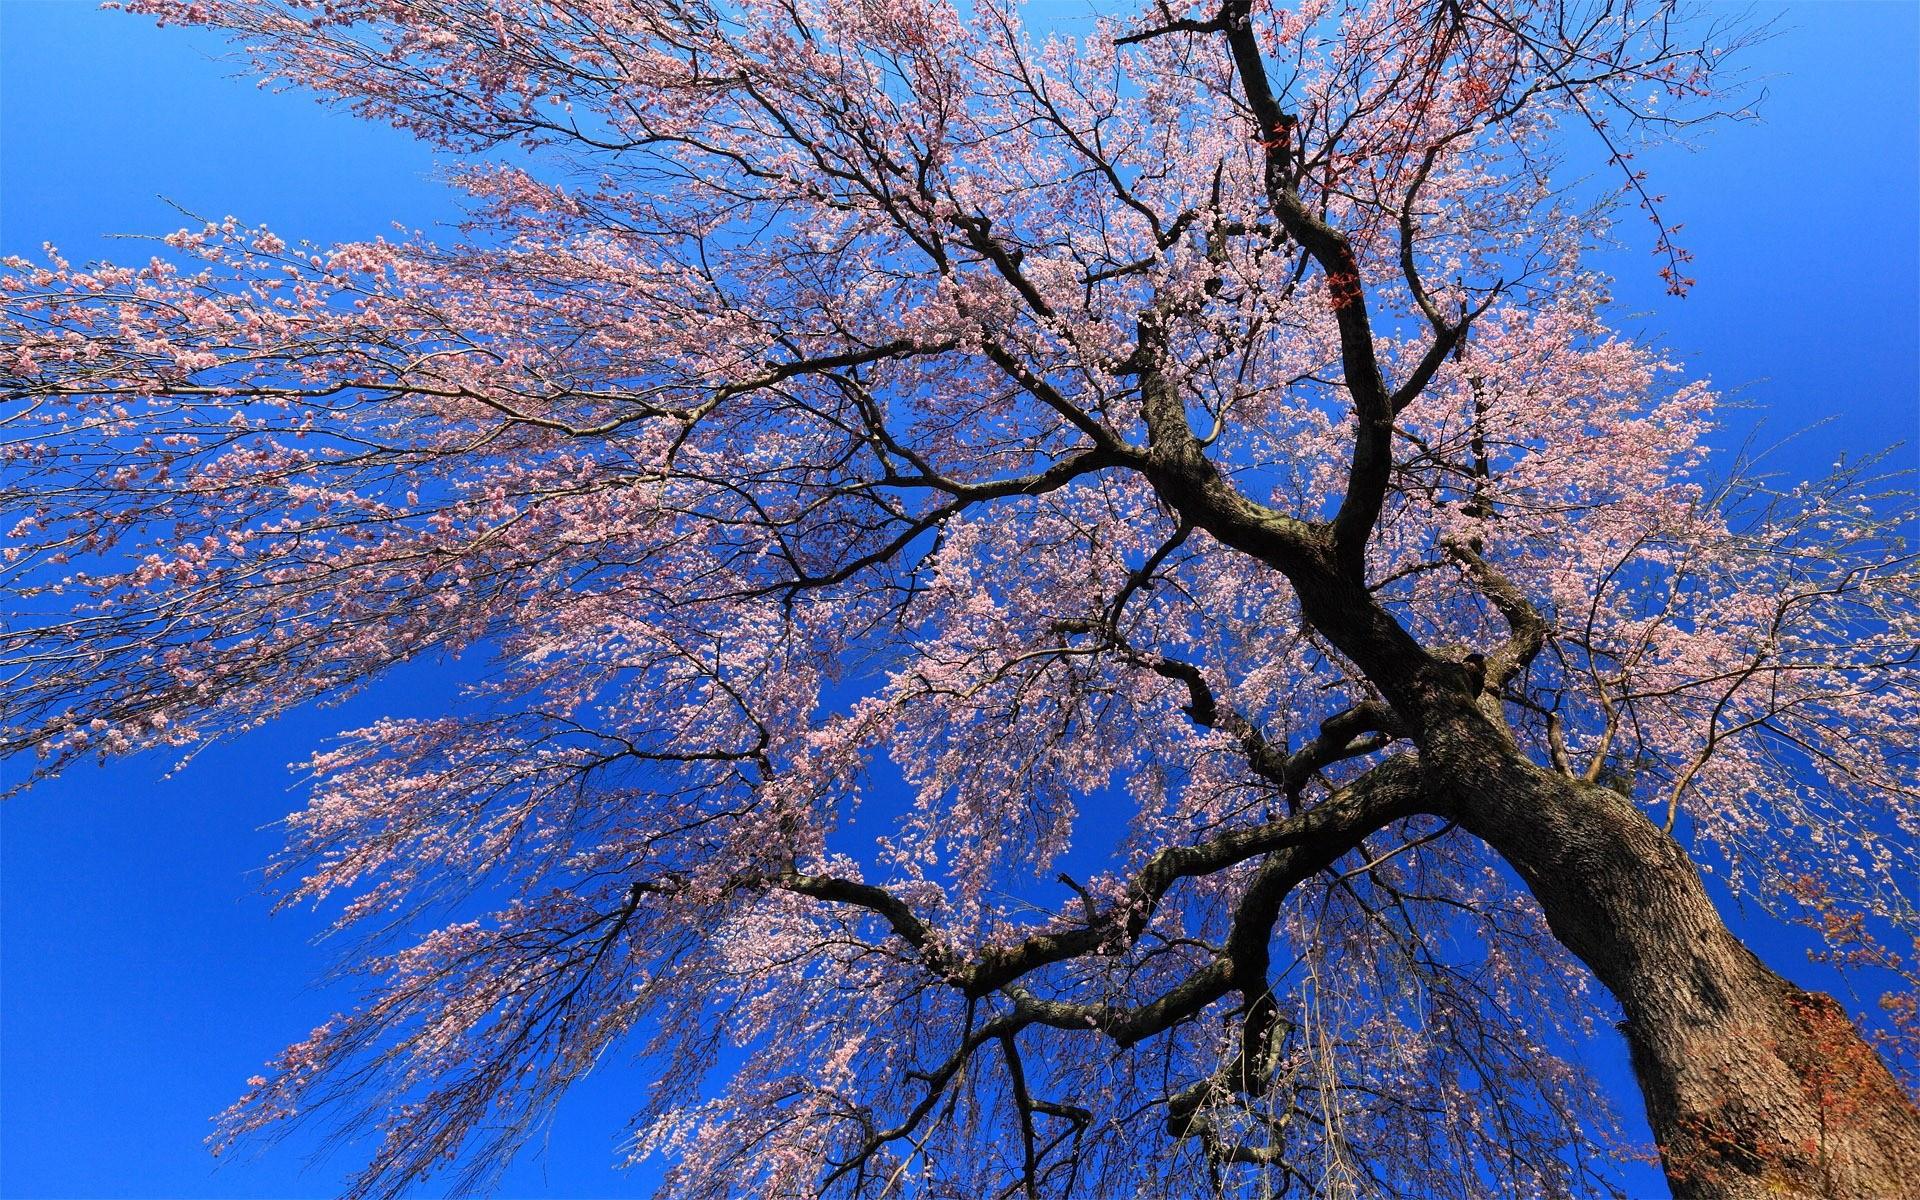 Nice tree, hd wallpapers on -> www.